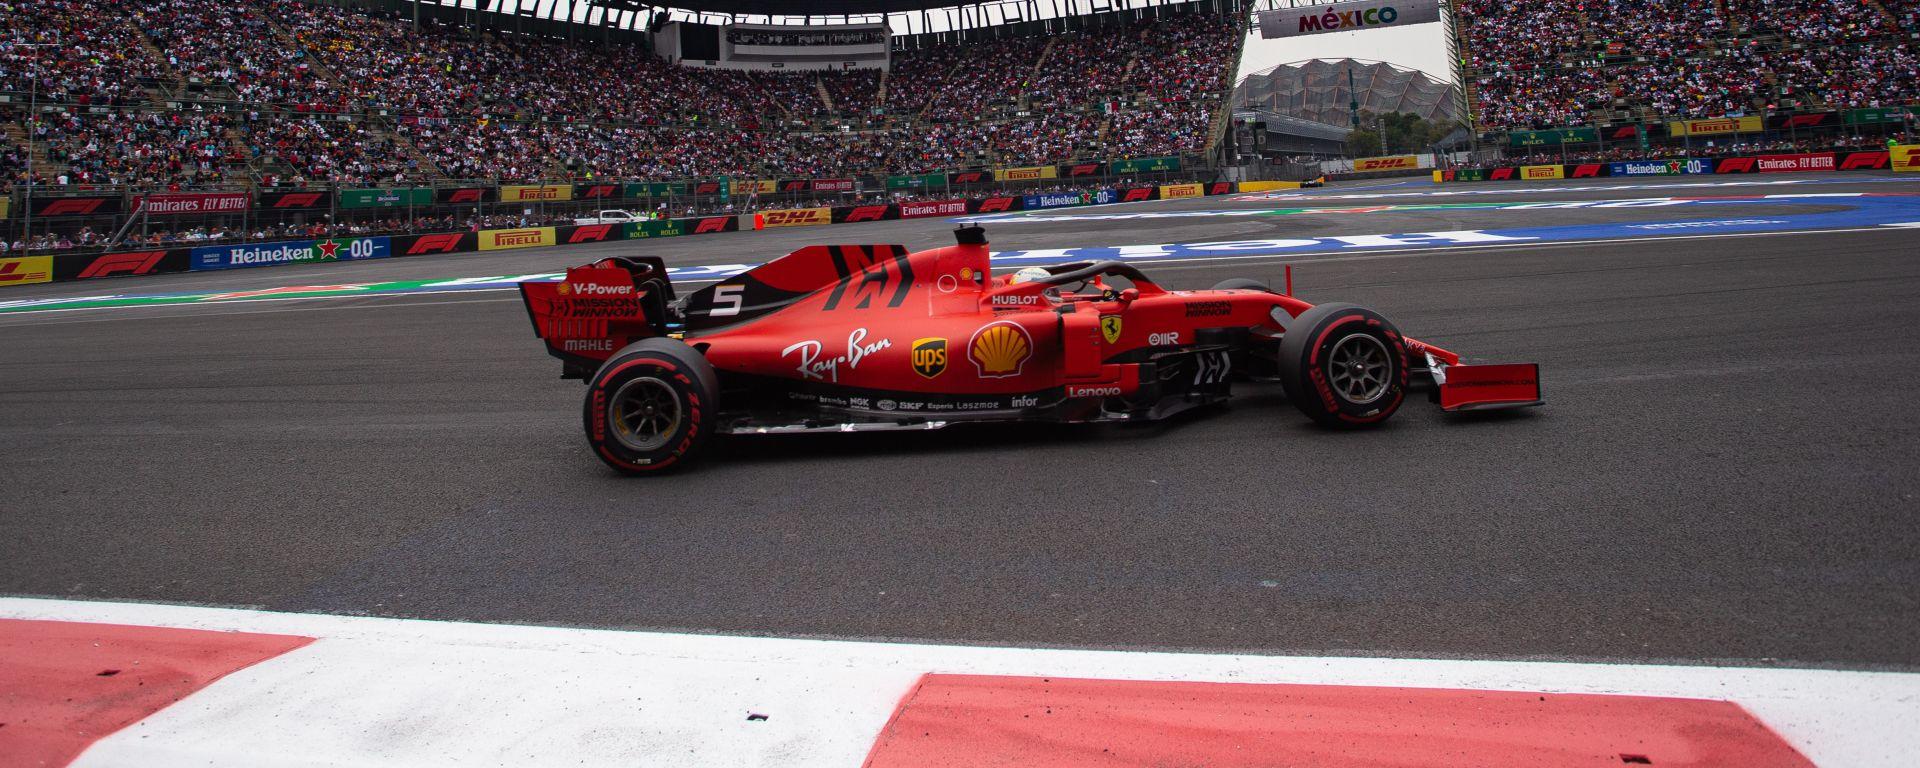 F1 GP Messico 2019, Città del Messico: Sebastian Vettel (Ferrari)